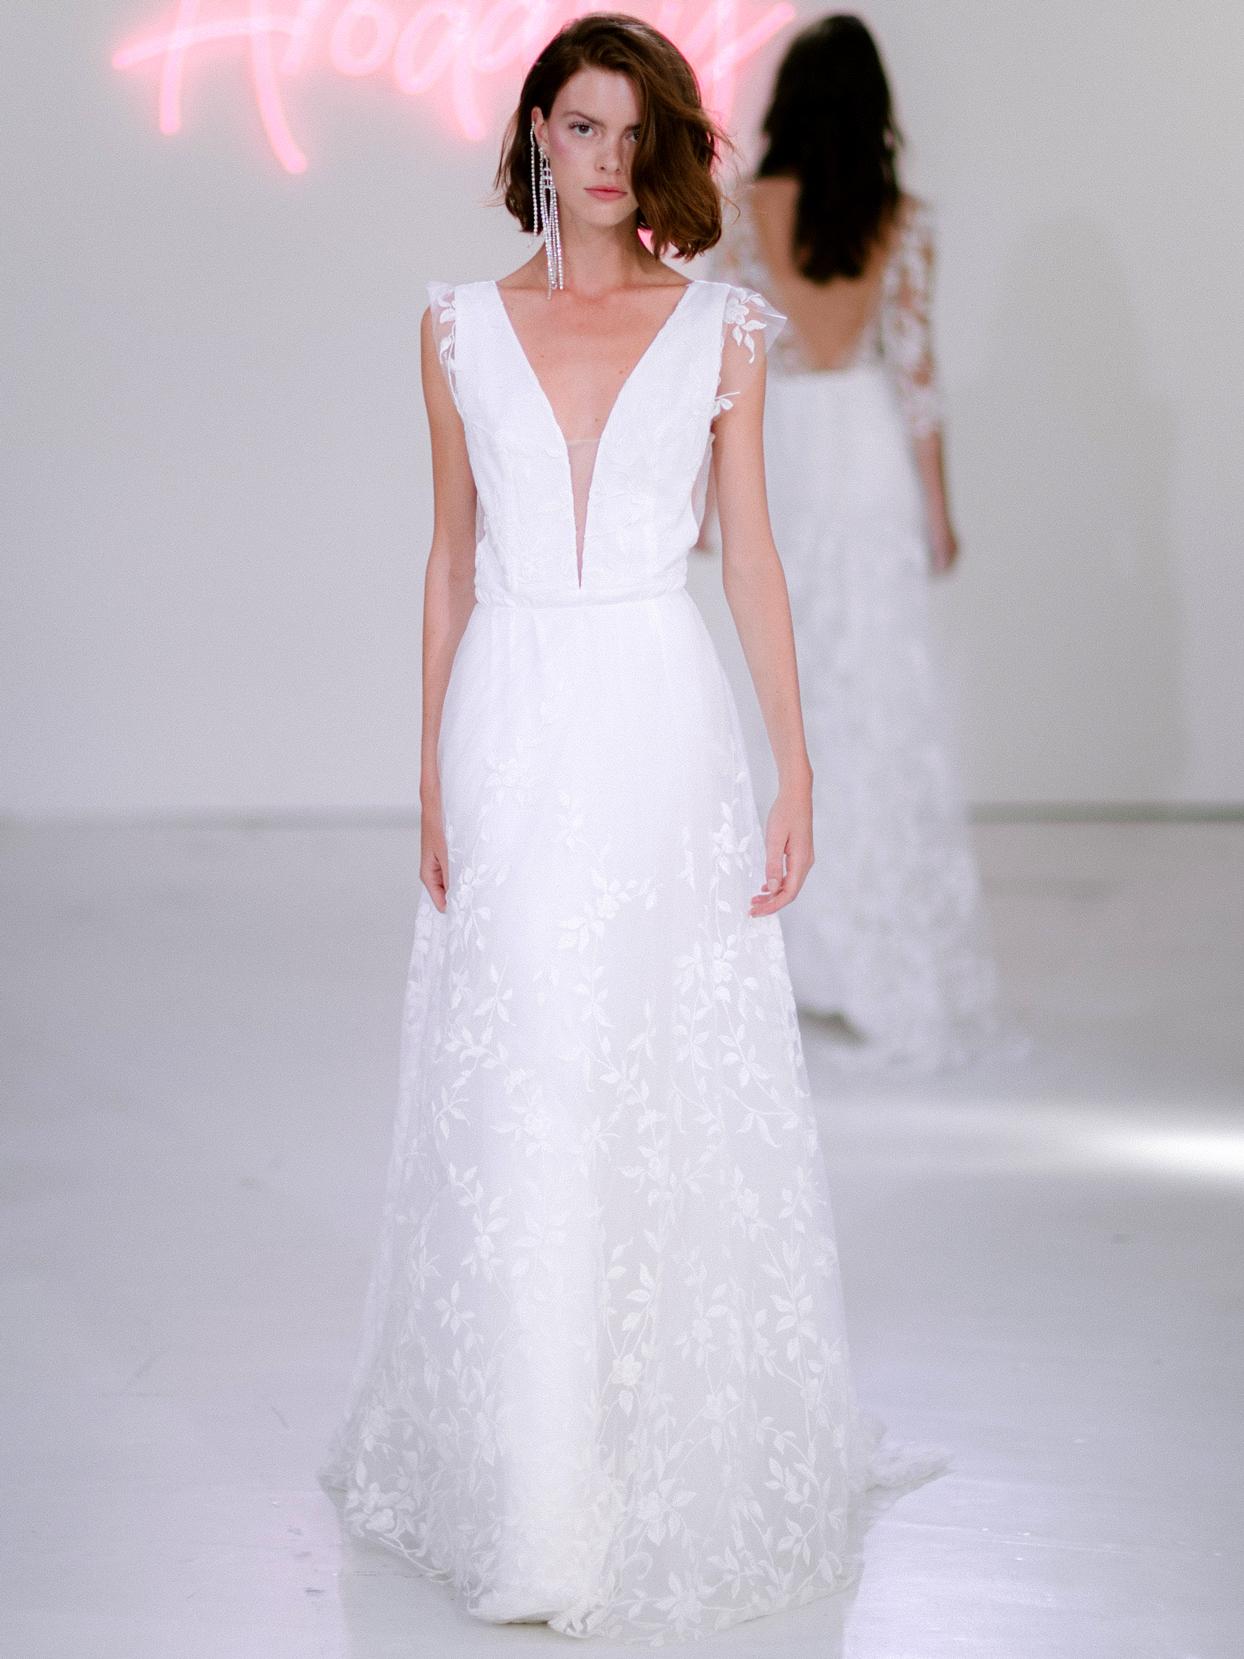 Rime Arodaky X The Mews Bridal plunging v-neck lace cap sleeves wedding dress fall 2020